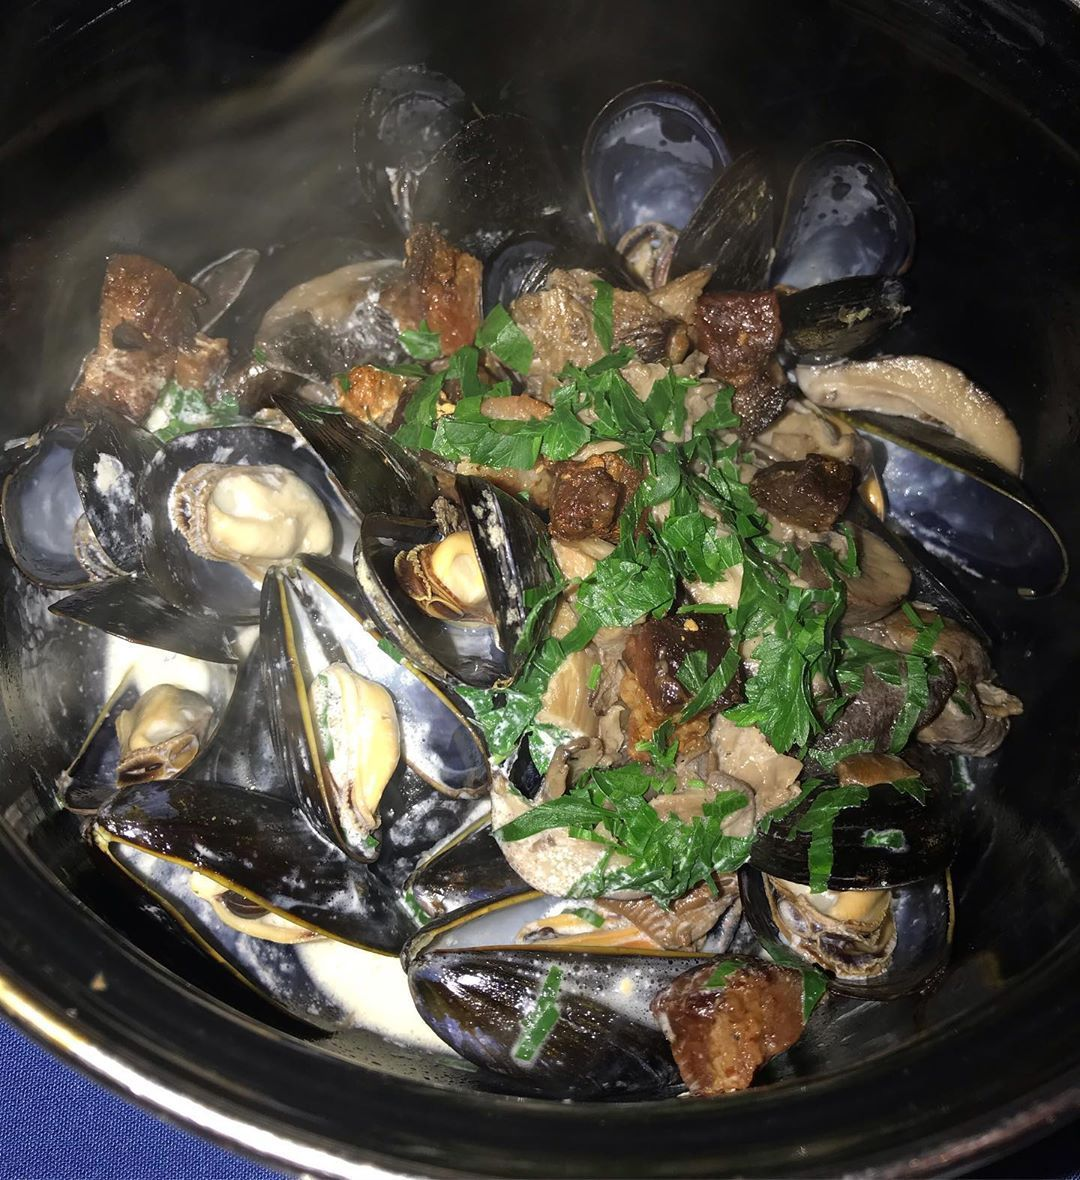 Mussels yum